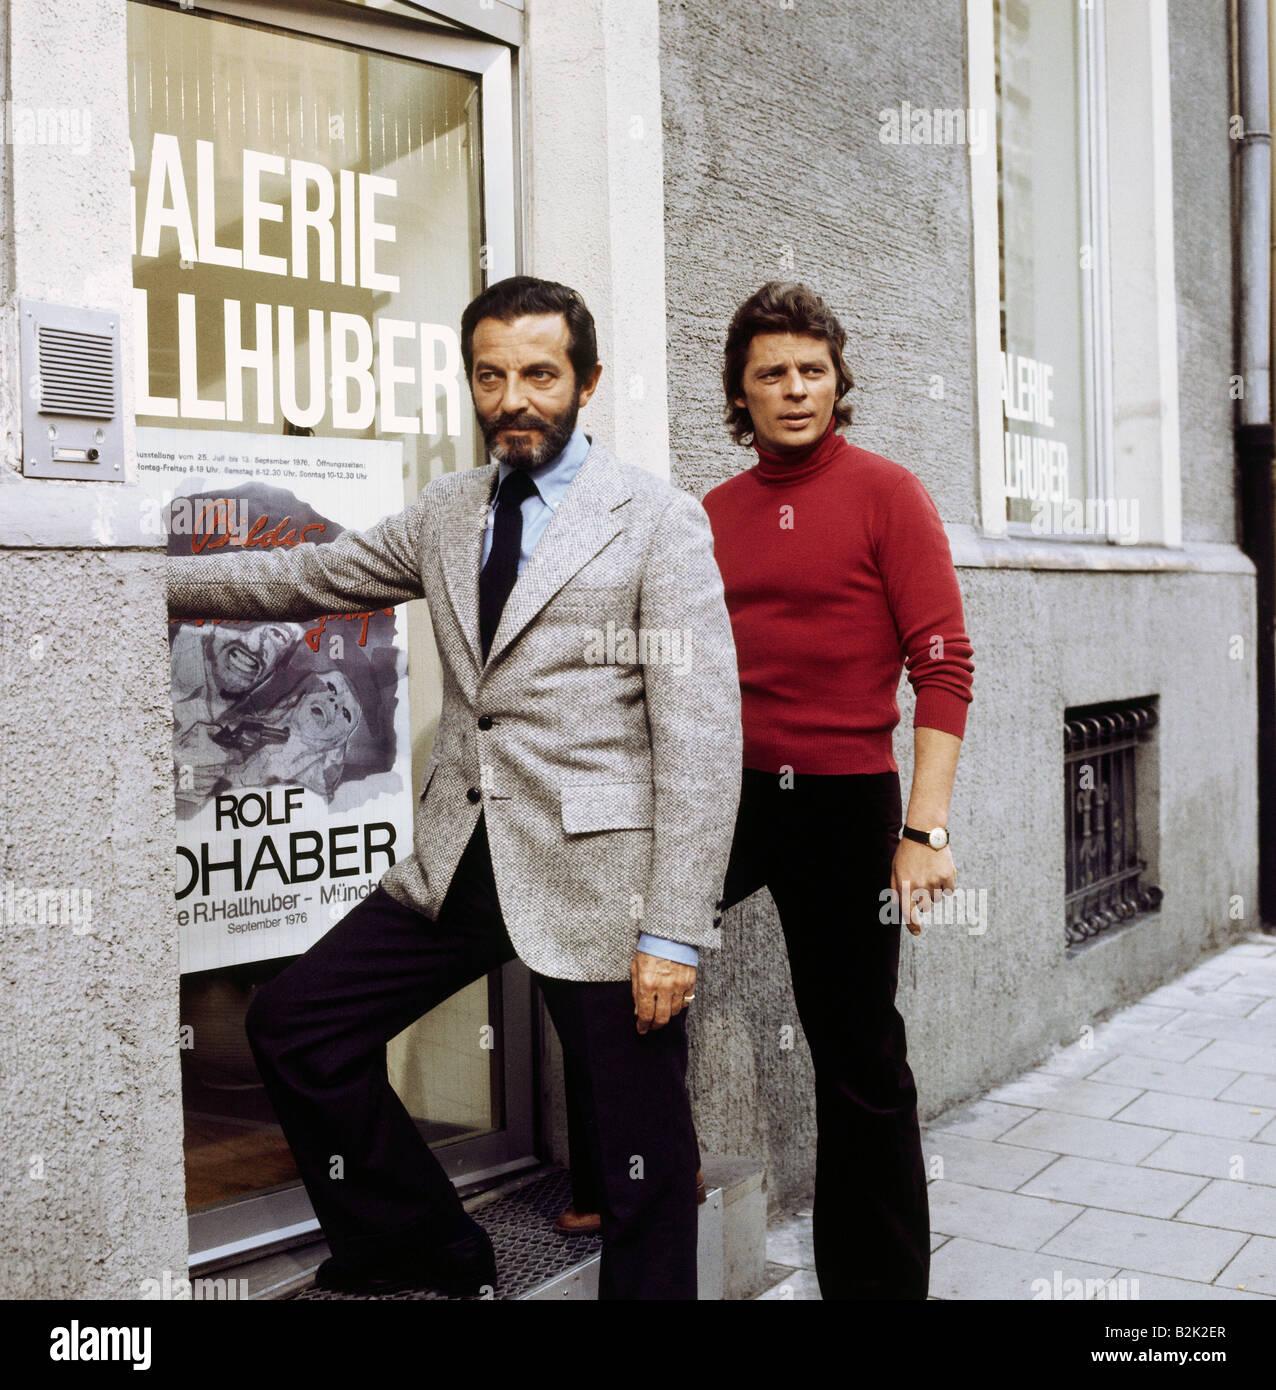 "Braun, Pinkas, 7.1.1923 - 24.6.2008, Swiss actor, full length, with Werner Umberg, tv series ""Joerg Preda berichtet"",Stock Photo"